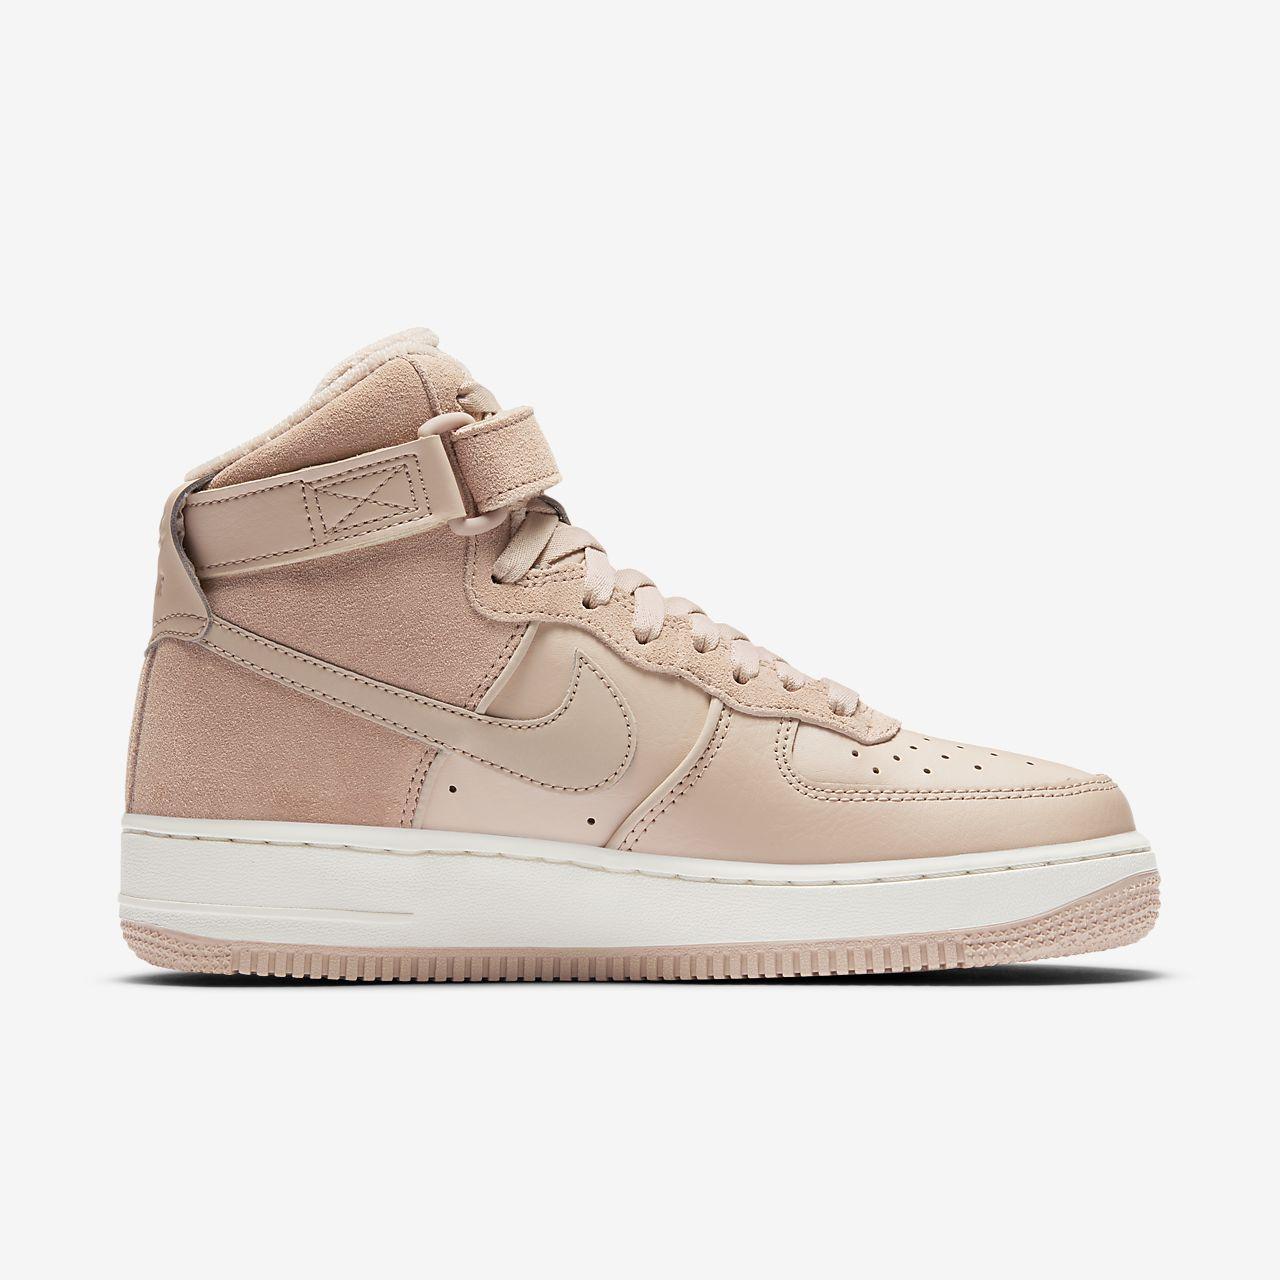 afaf4691ede Nike Air Force 1 High Winterized Women s Shoe. Nike.com SK